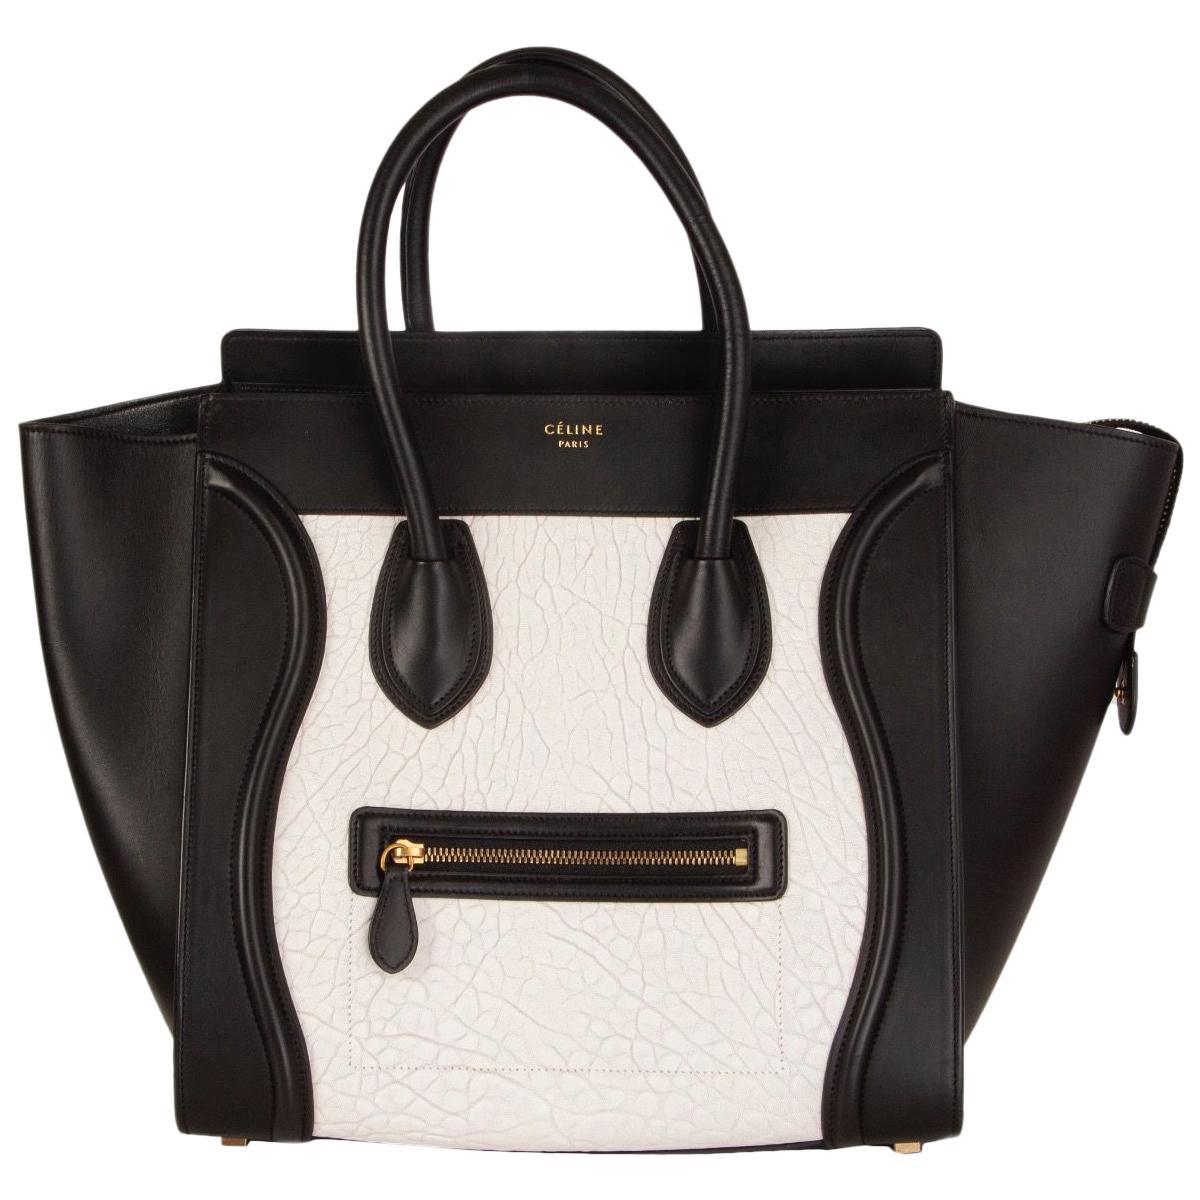 CELINE black & white  leather MINI LUGGAGE Tote Shoulder Bag